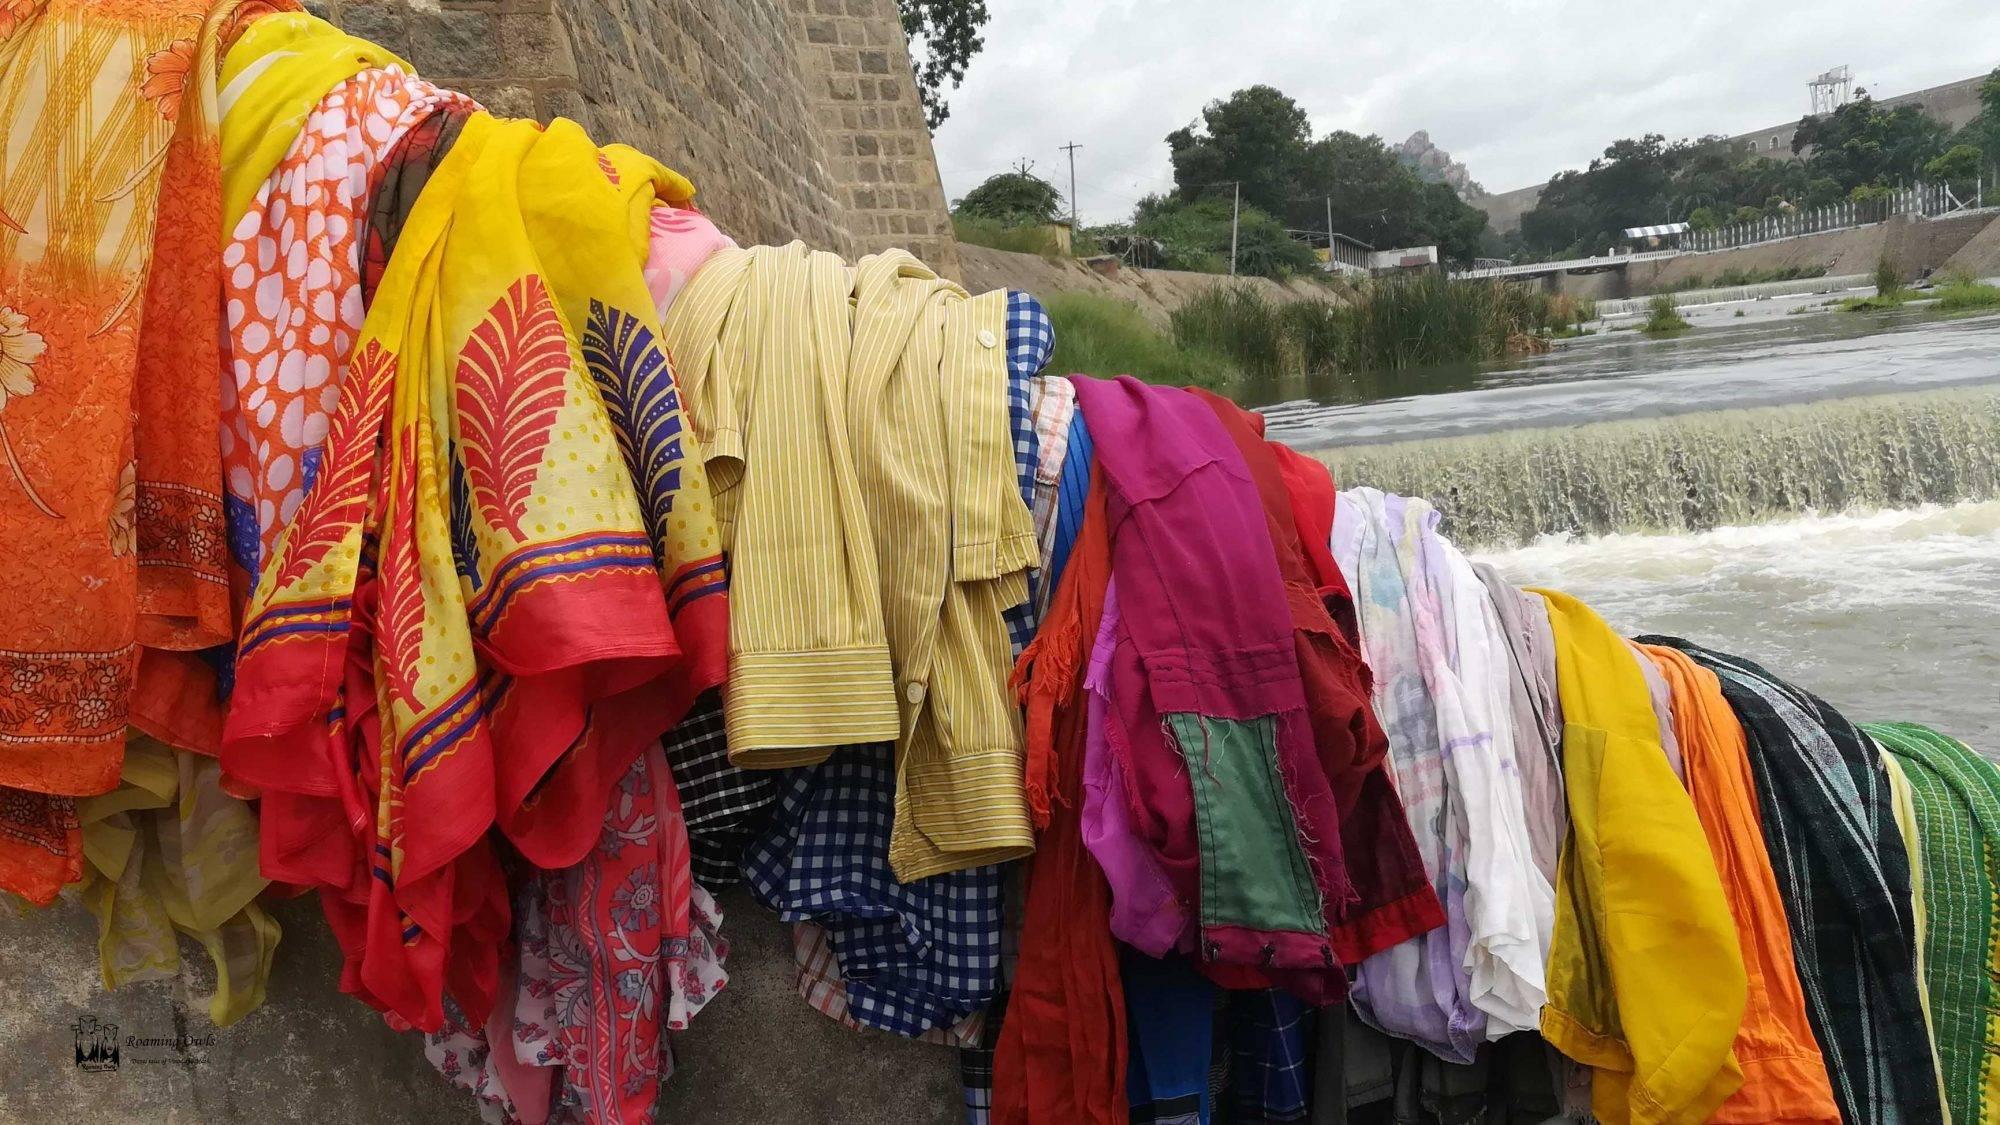 Tamilnadu Clothes, Cloth Washing river, cauvery washing